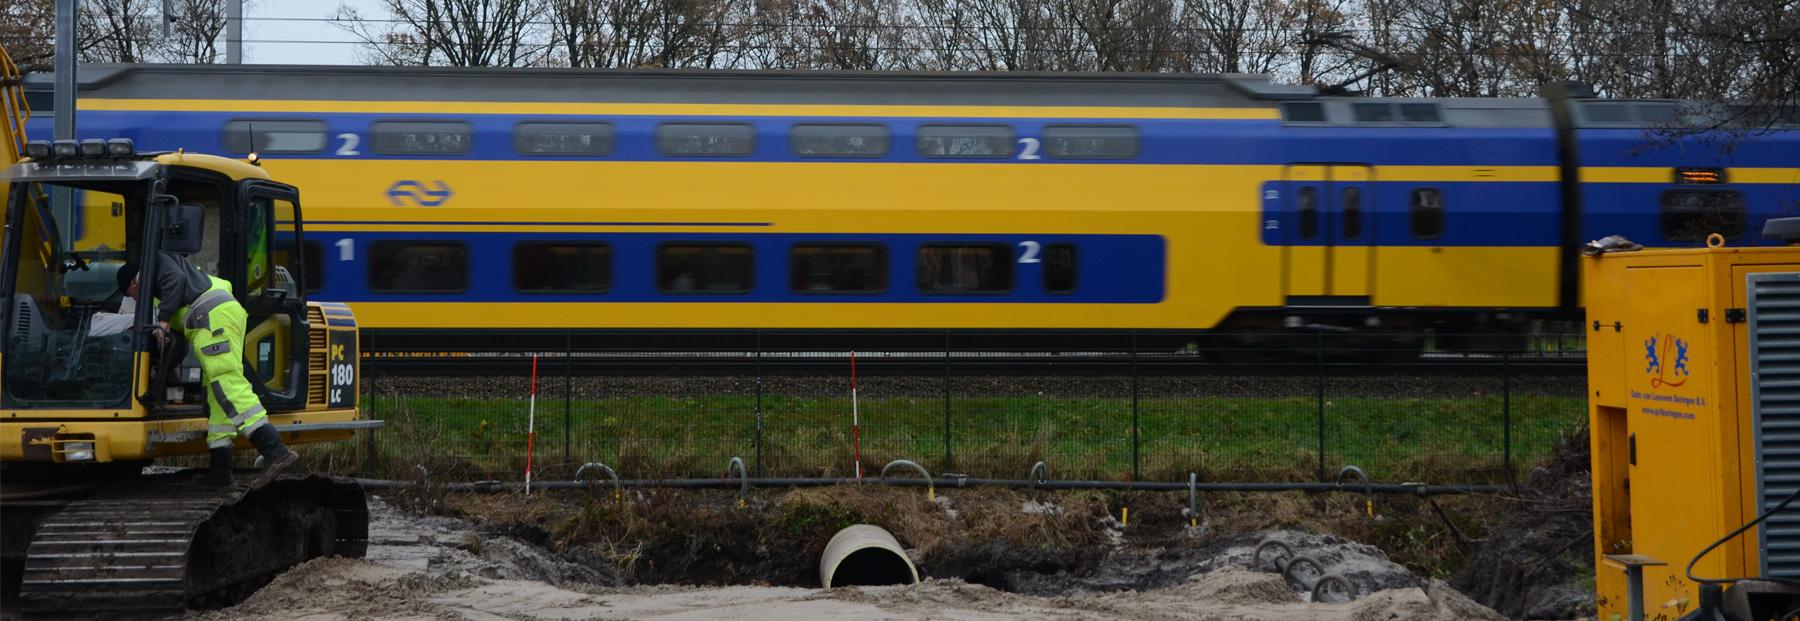 Klarenbeek Trein NS boringen